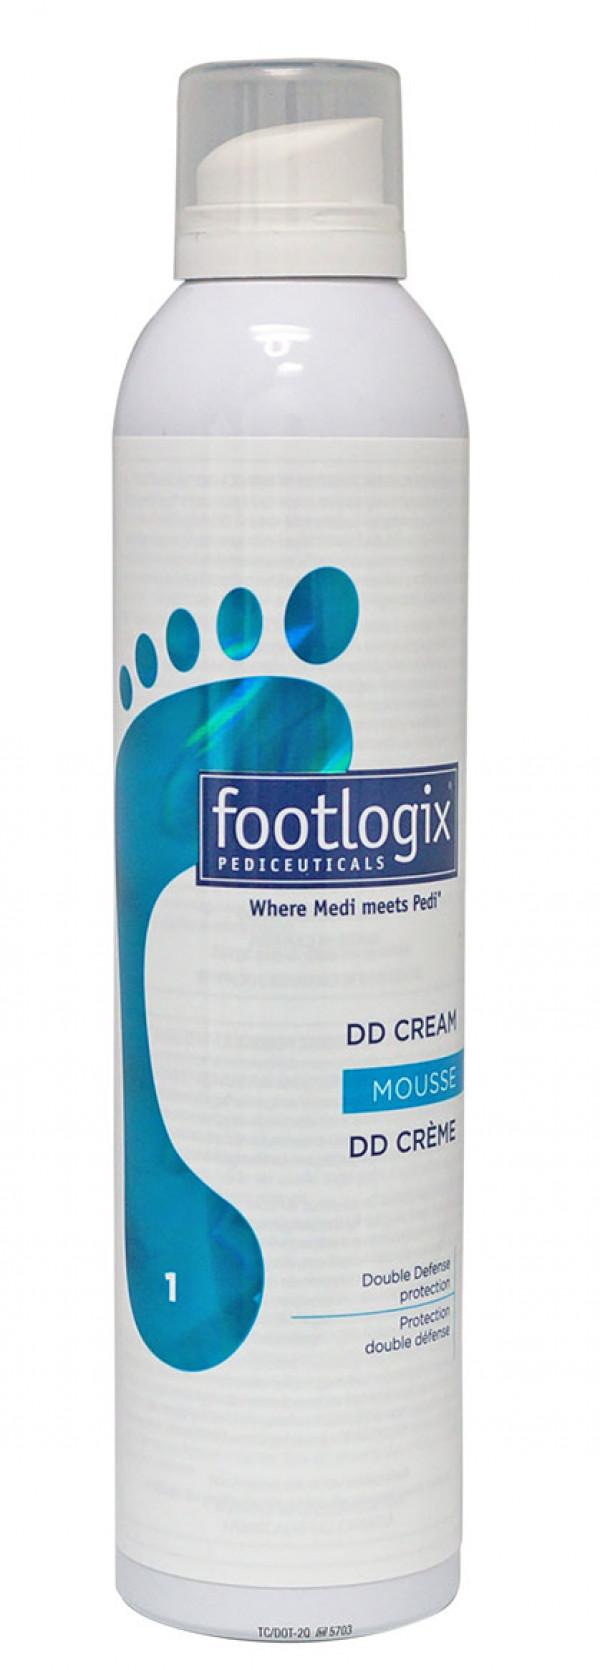 Footlogix 1 DD-vaahtovoide herkälle iholle 300 ml